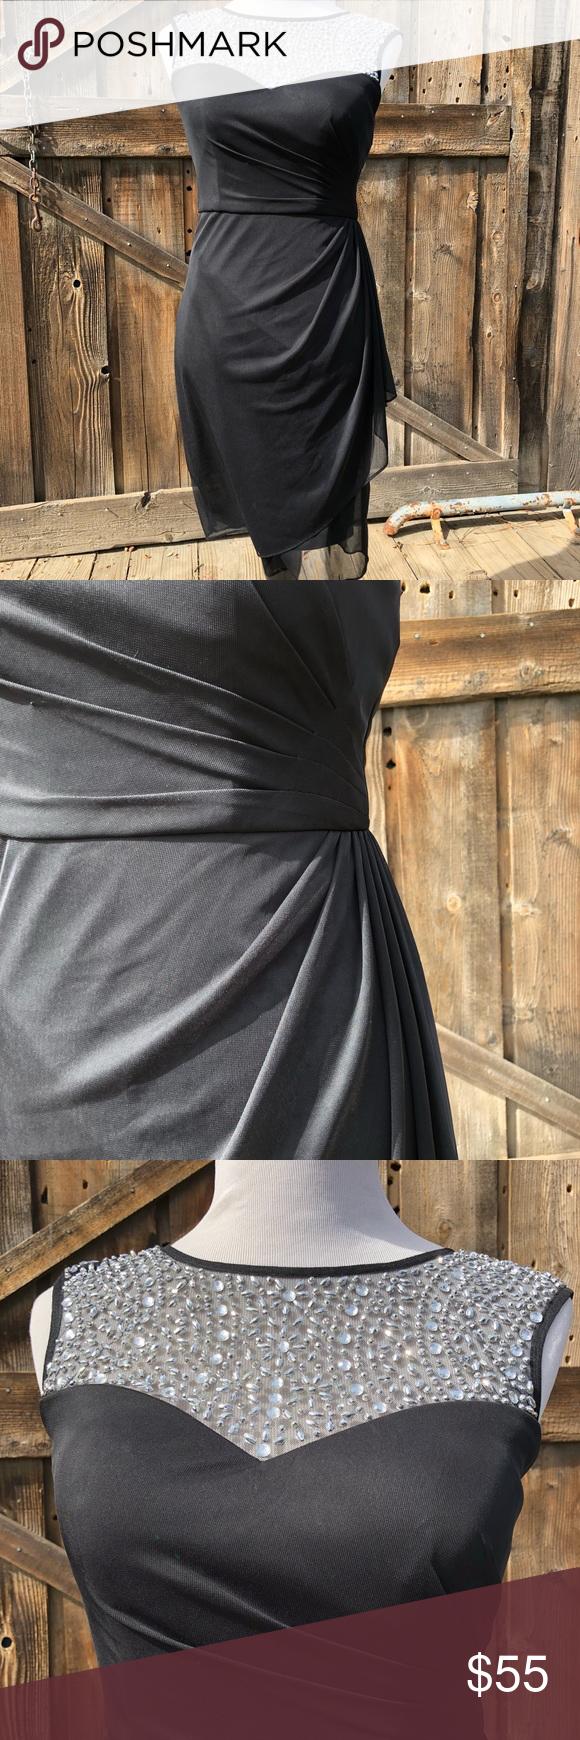 Nwt patra ltd black sequin dress nwt my posh closet pinterest